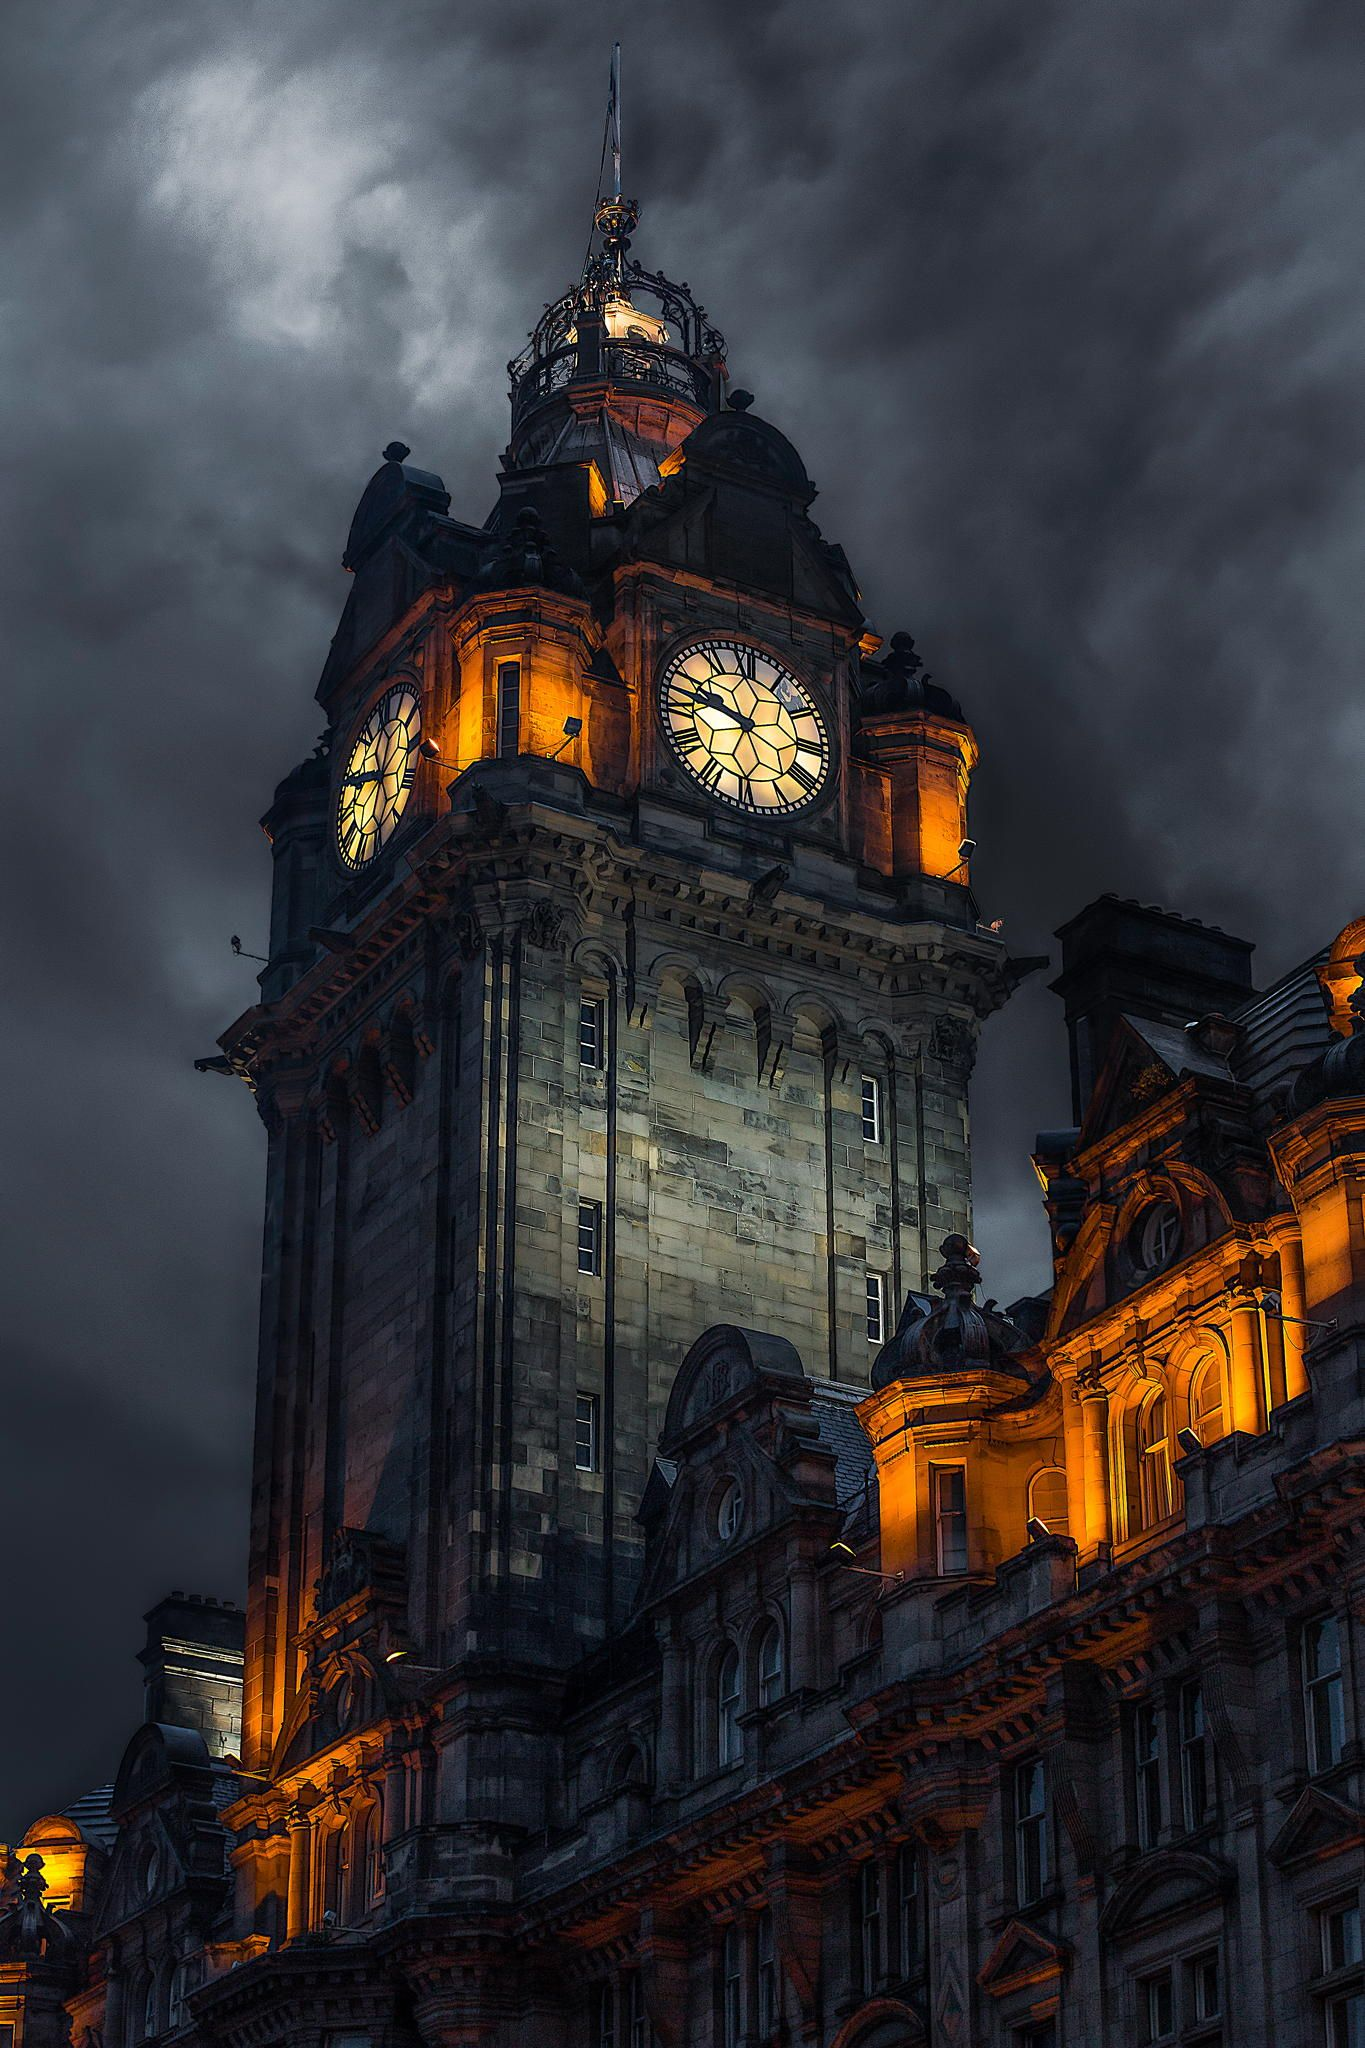 Clock tower - Edinburgh - Scotland & Clock tower - Edinburgh - Scotland | The Sword and the Scarf ...